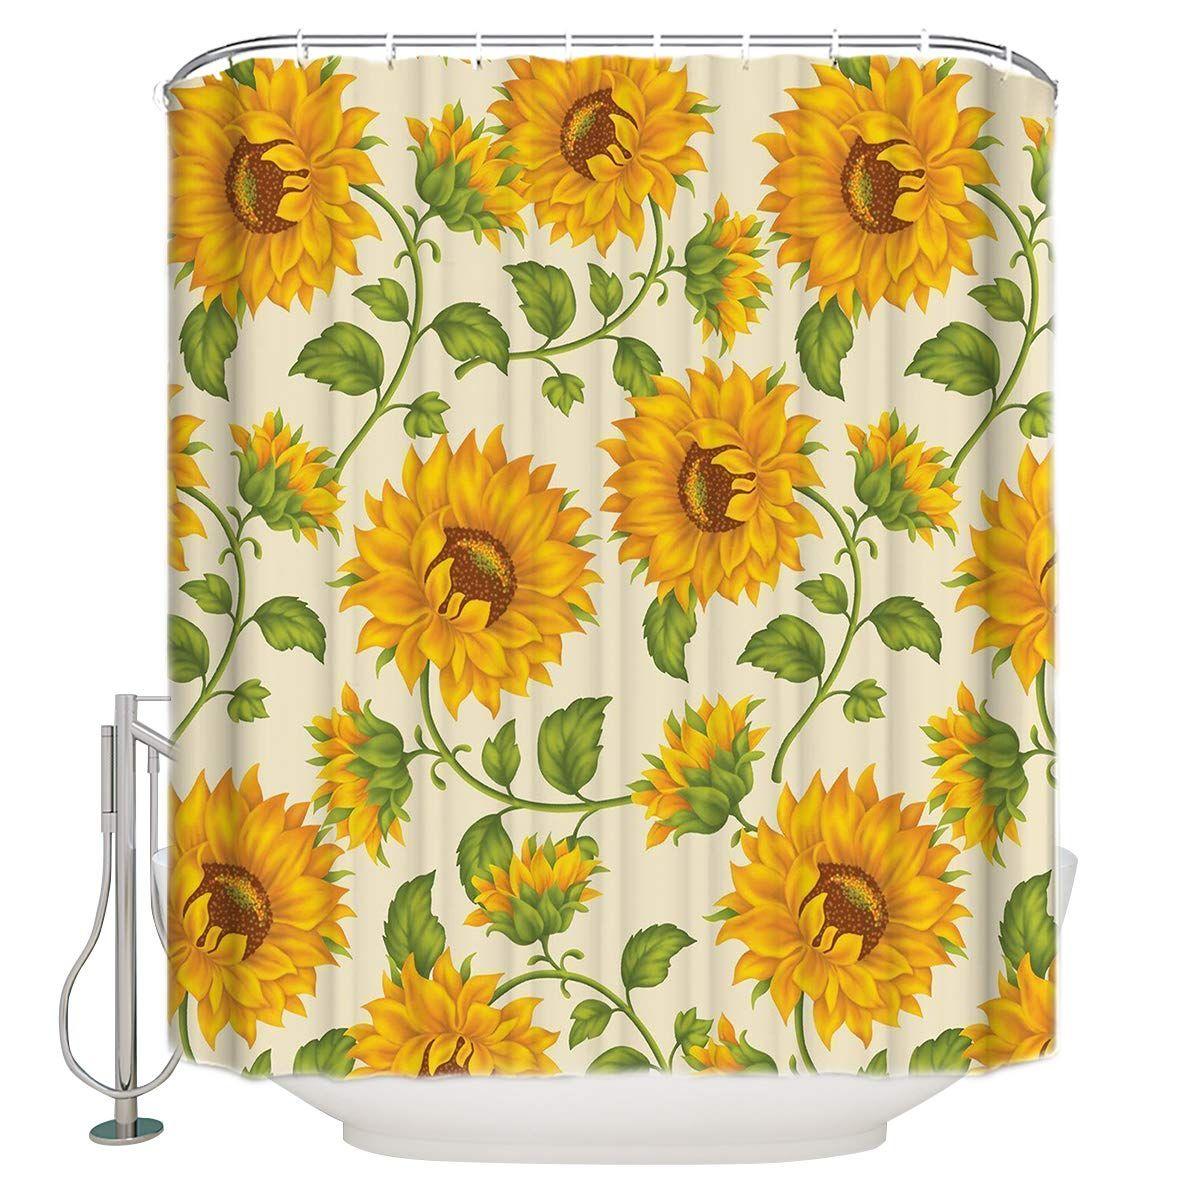 Cloud Dream Fashionable Design Sunflower Shower Curtain Waterproof Polyester Fabric Bath Curtain Design 4 Shower Curtain Curtain Designs Printed Shower Curtain